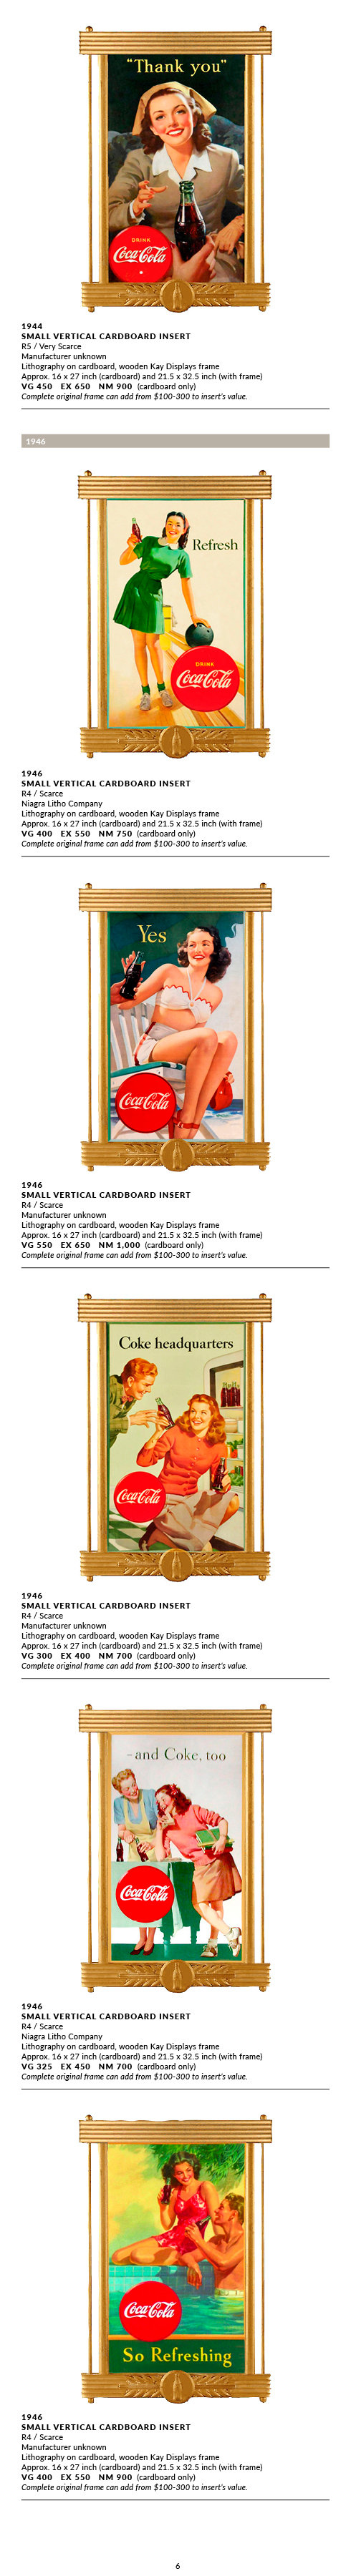 Inserts_1940s _Small_Verticals6.jpg